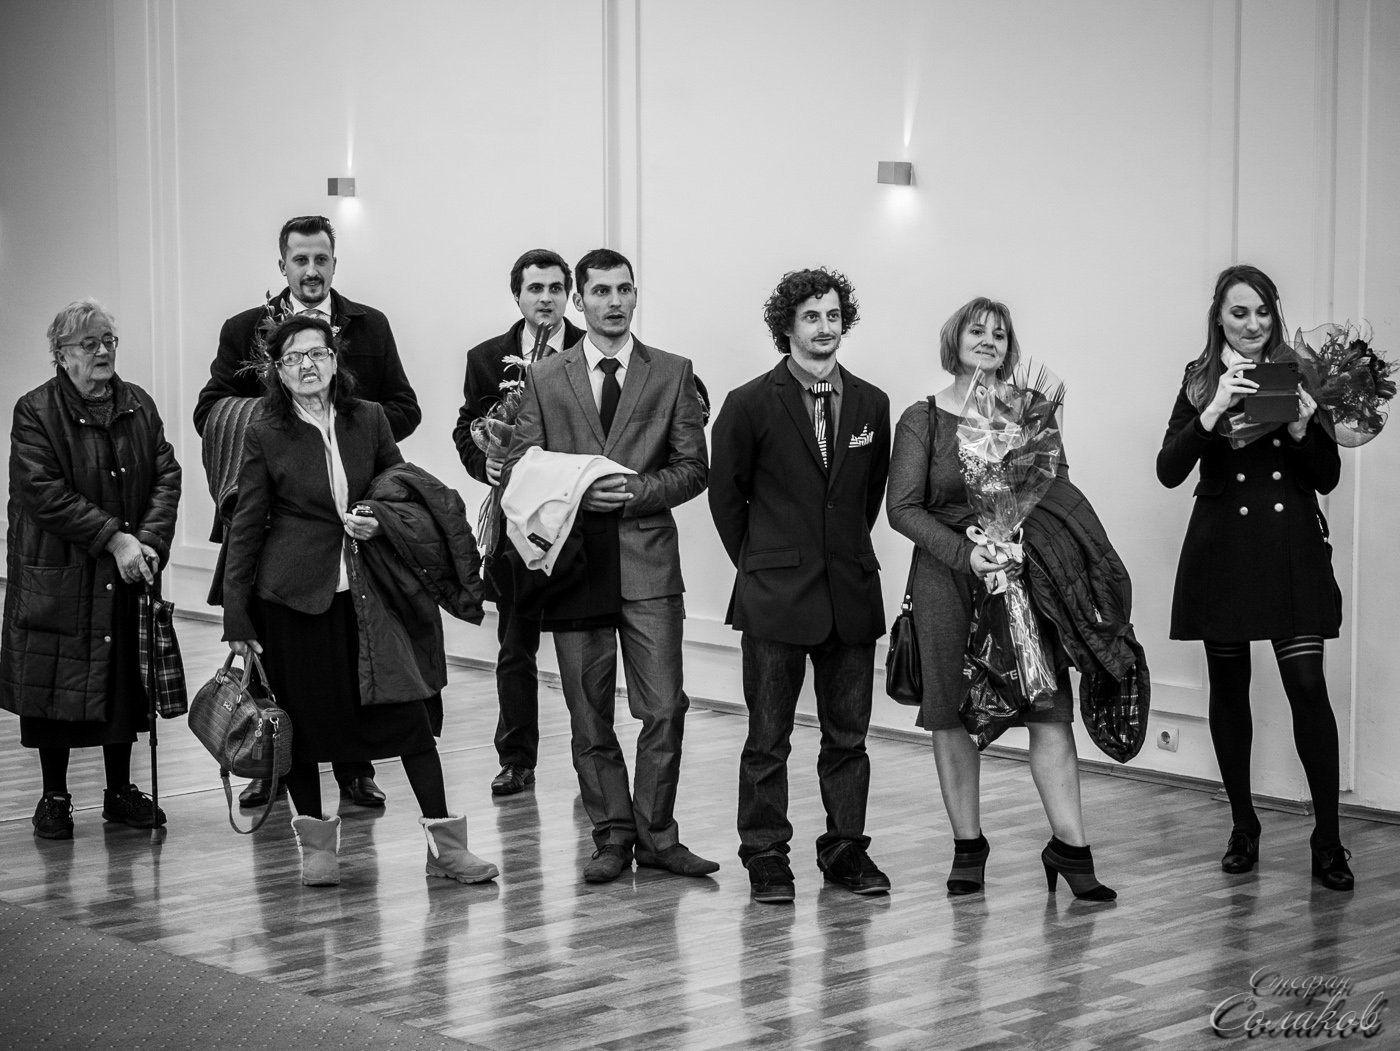 сватбена-фотография-софия-невена-слави-98